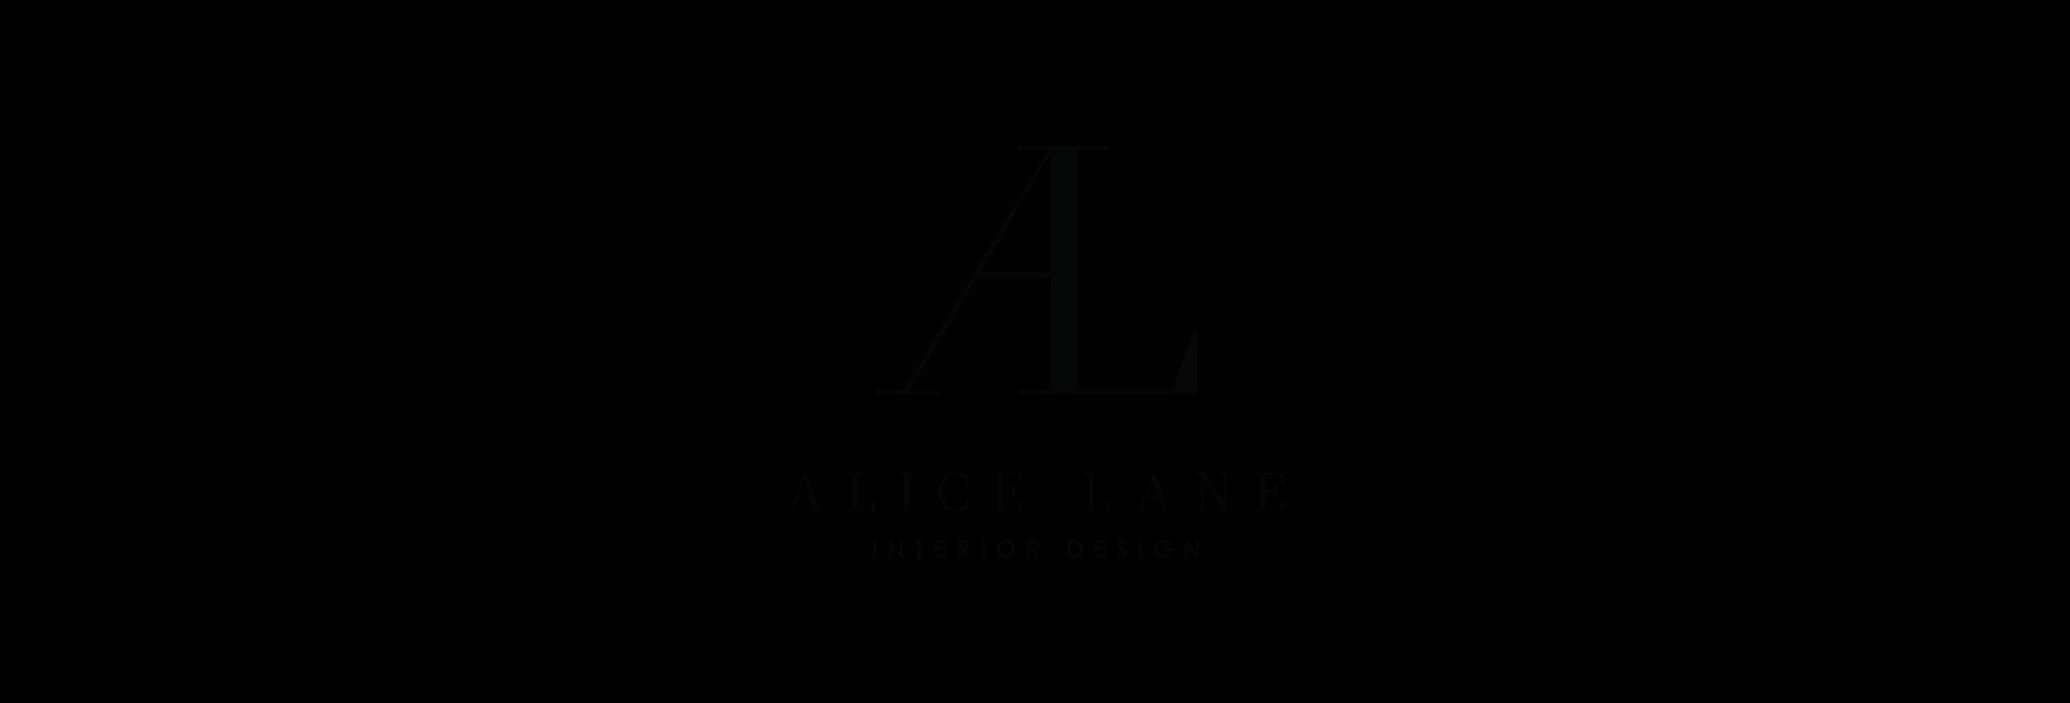 AliceLaneCaseStudy-logo.png